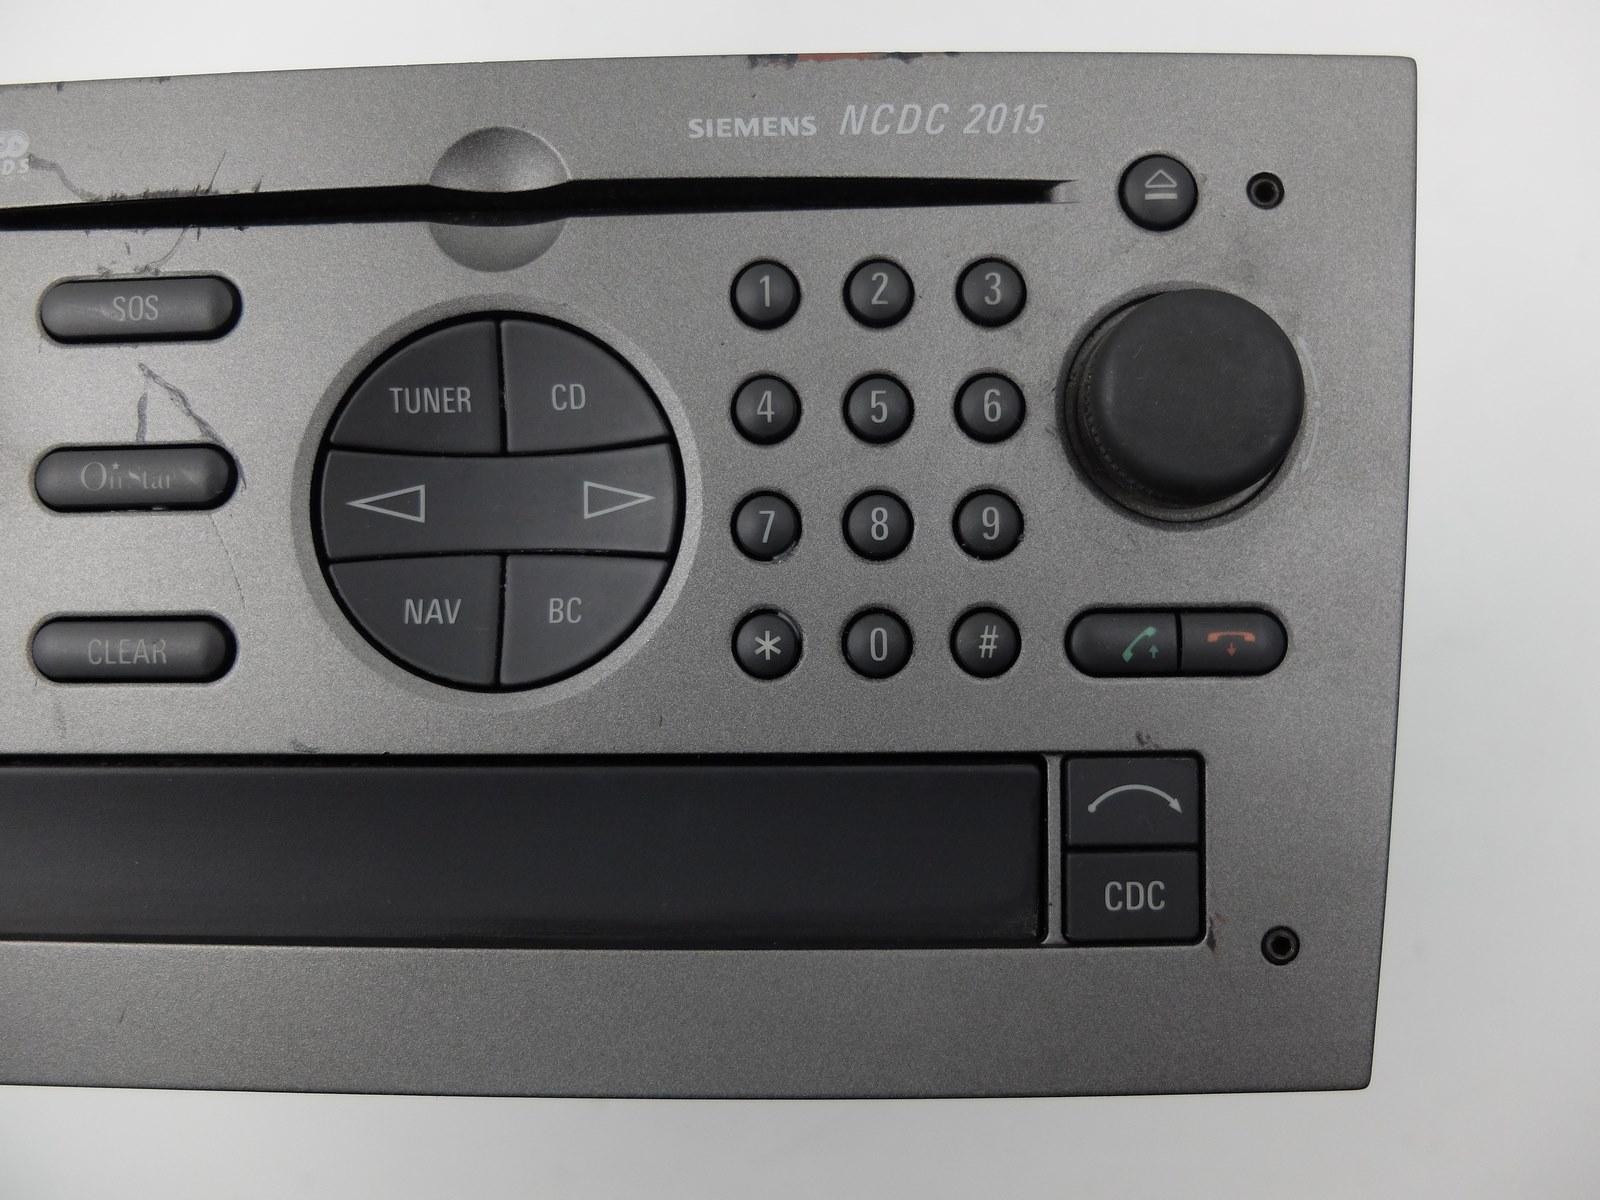 Cd-Radio Navi Opel 24441243 NCDC2015 UR7 Siemens 1133   eBay